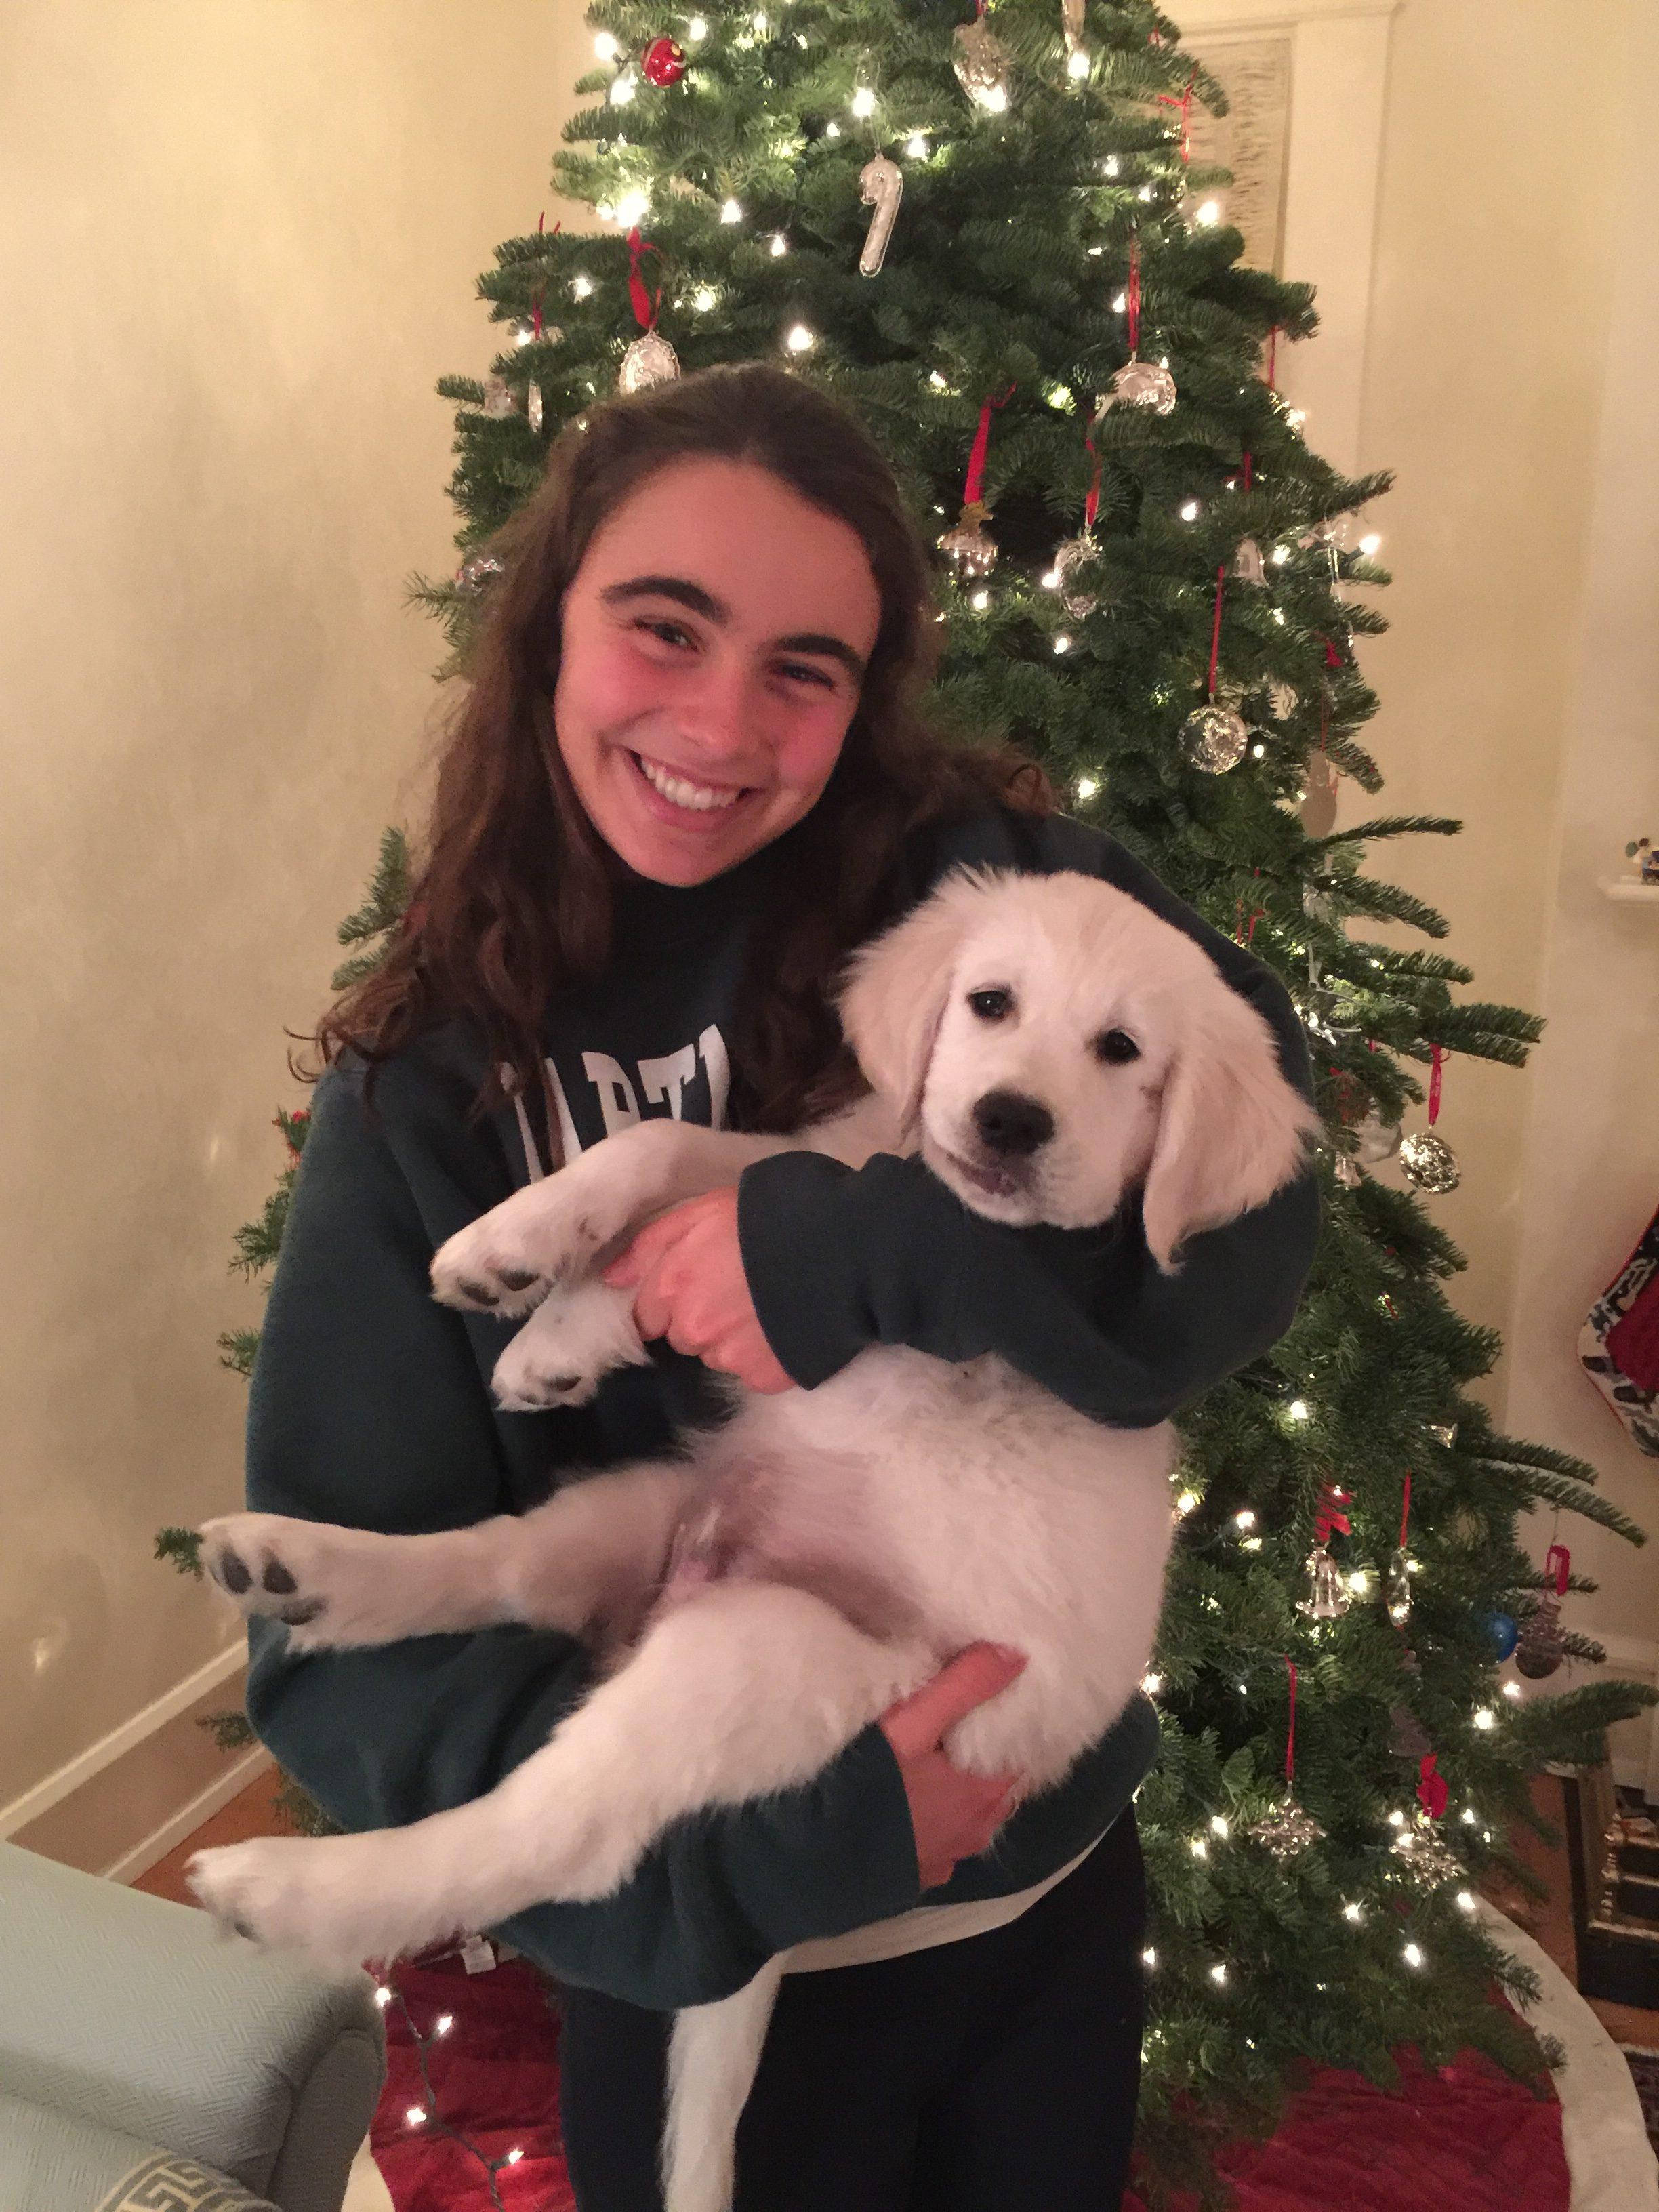 Sarah in Dartmouth sweatshirt with puppy